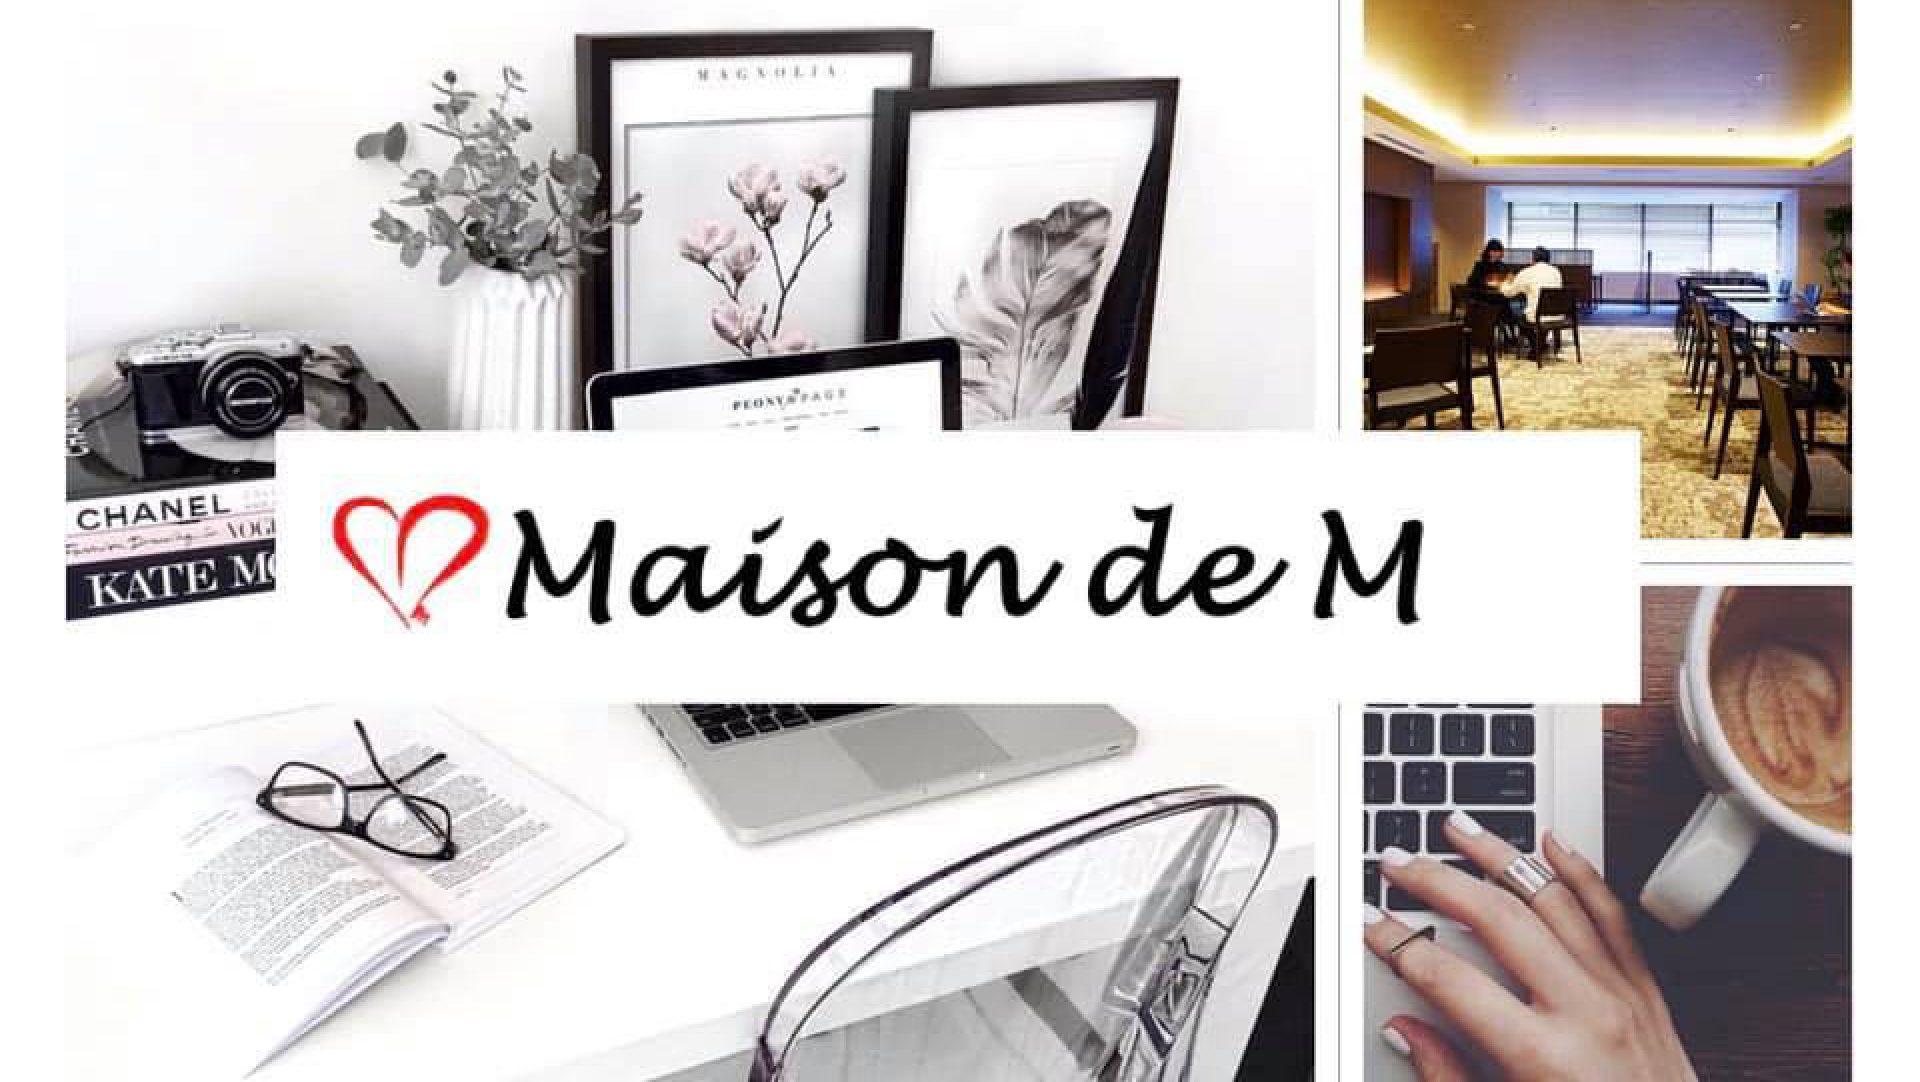 株式会社Maison de M